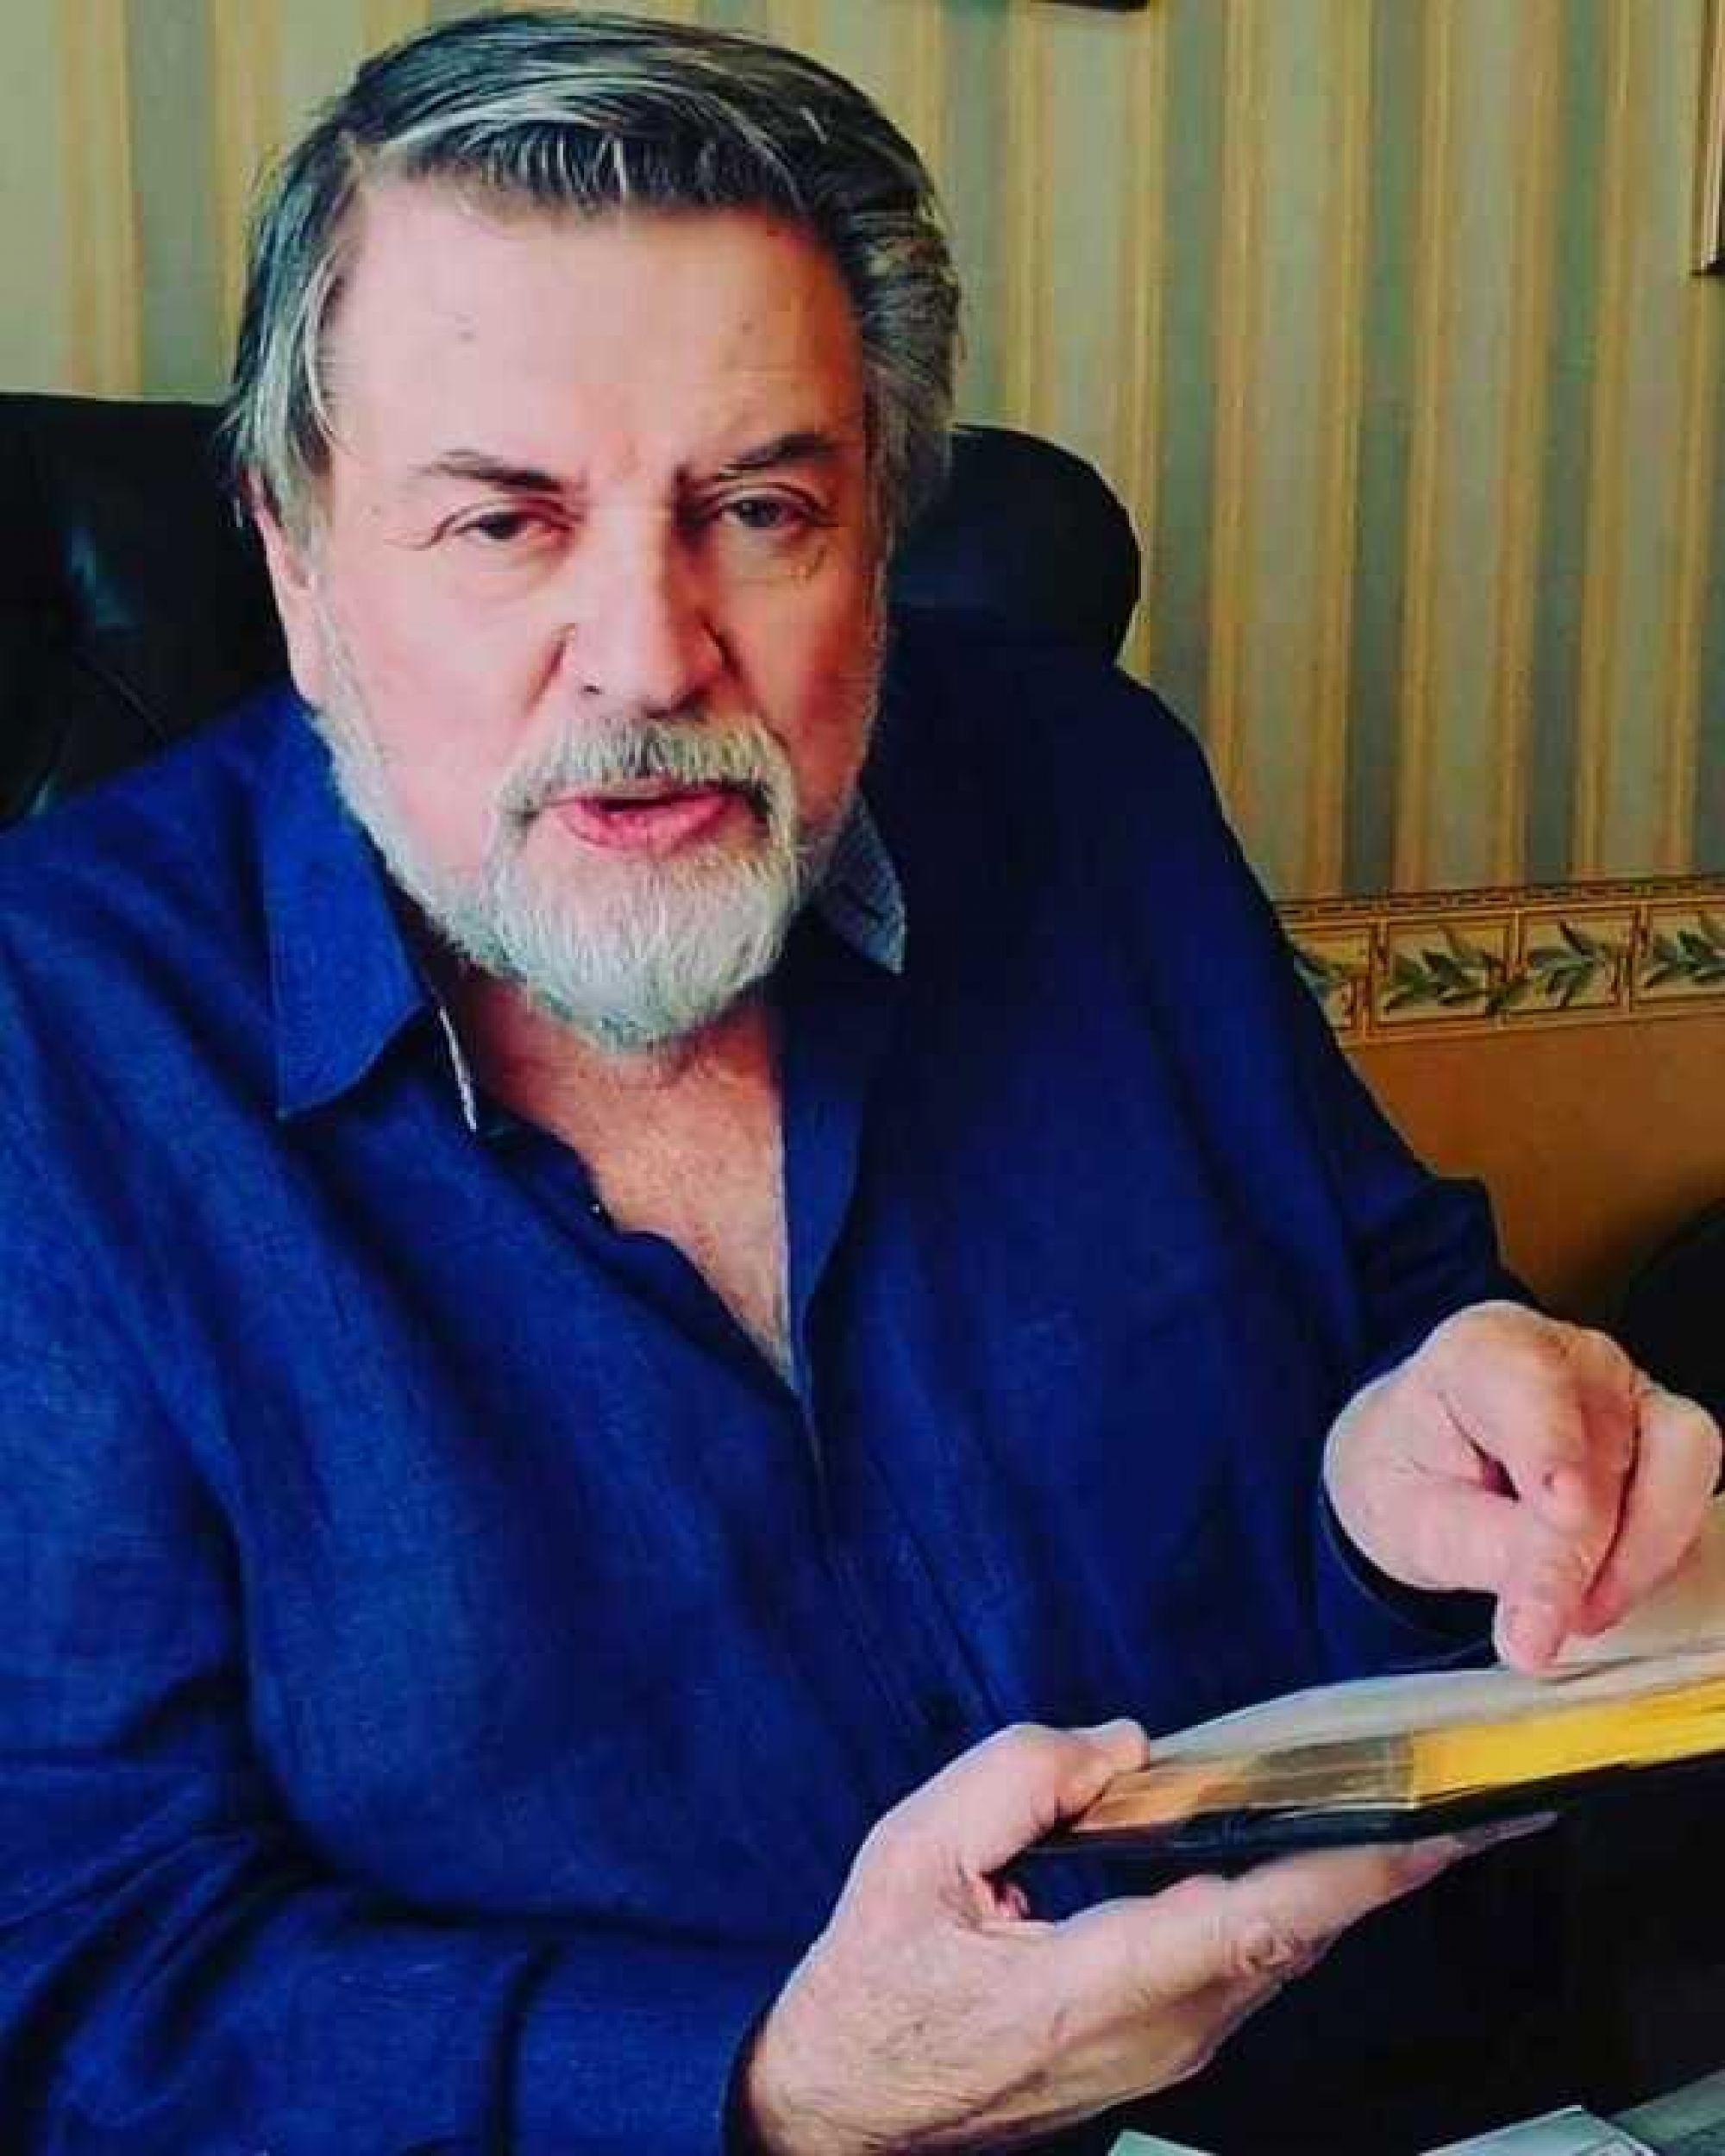 Актер Александр Ширвиндт попал в аварию